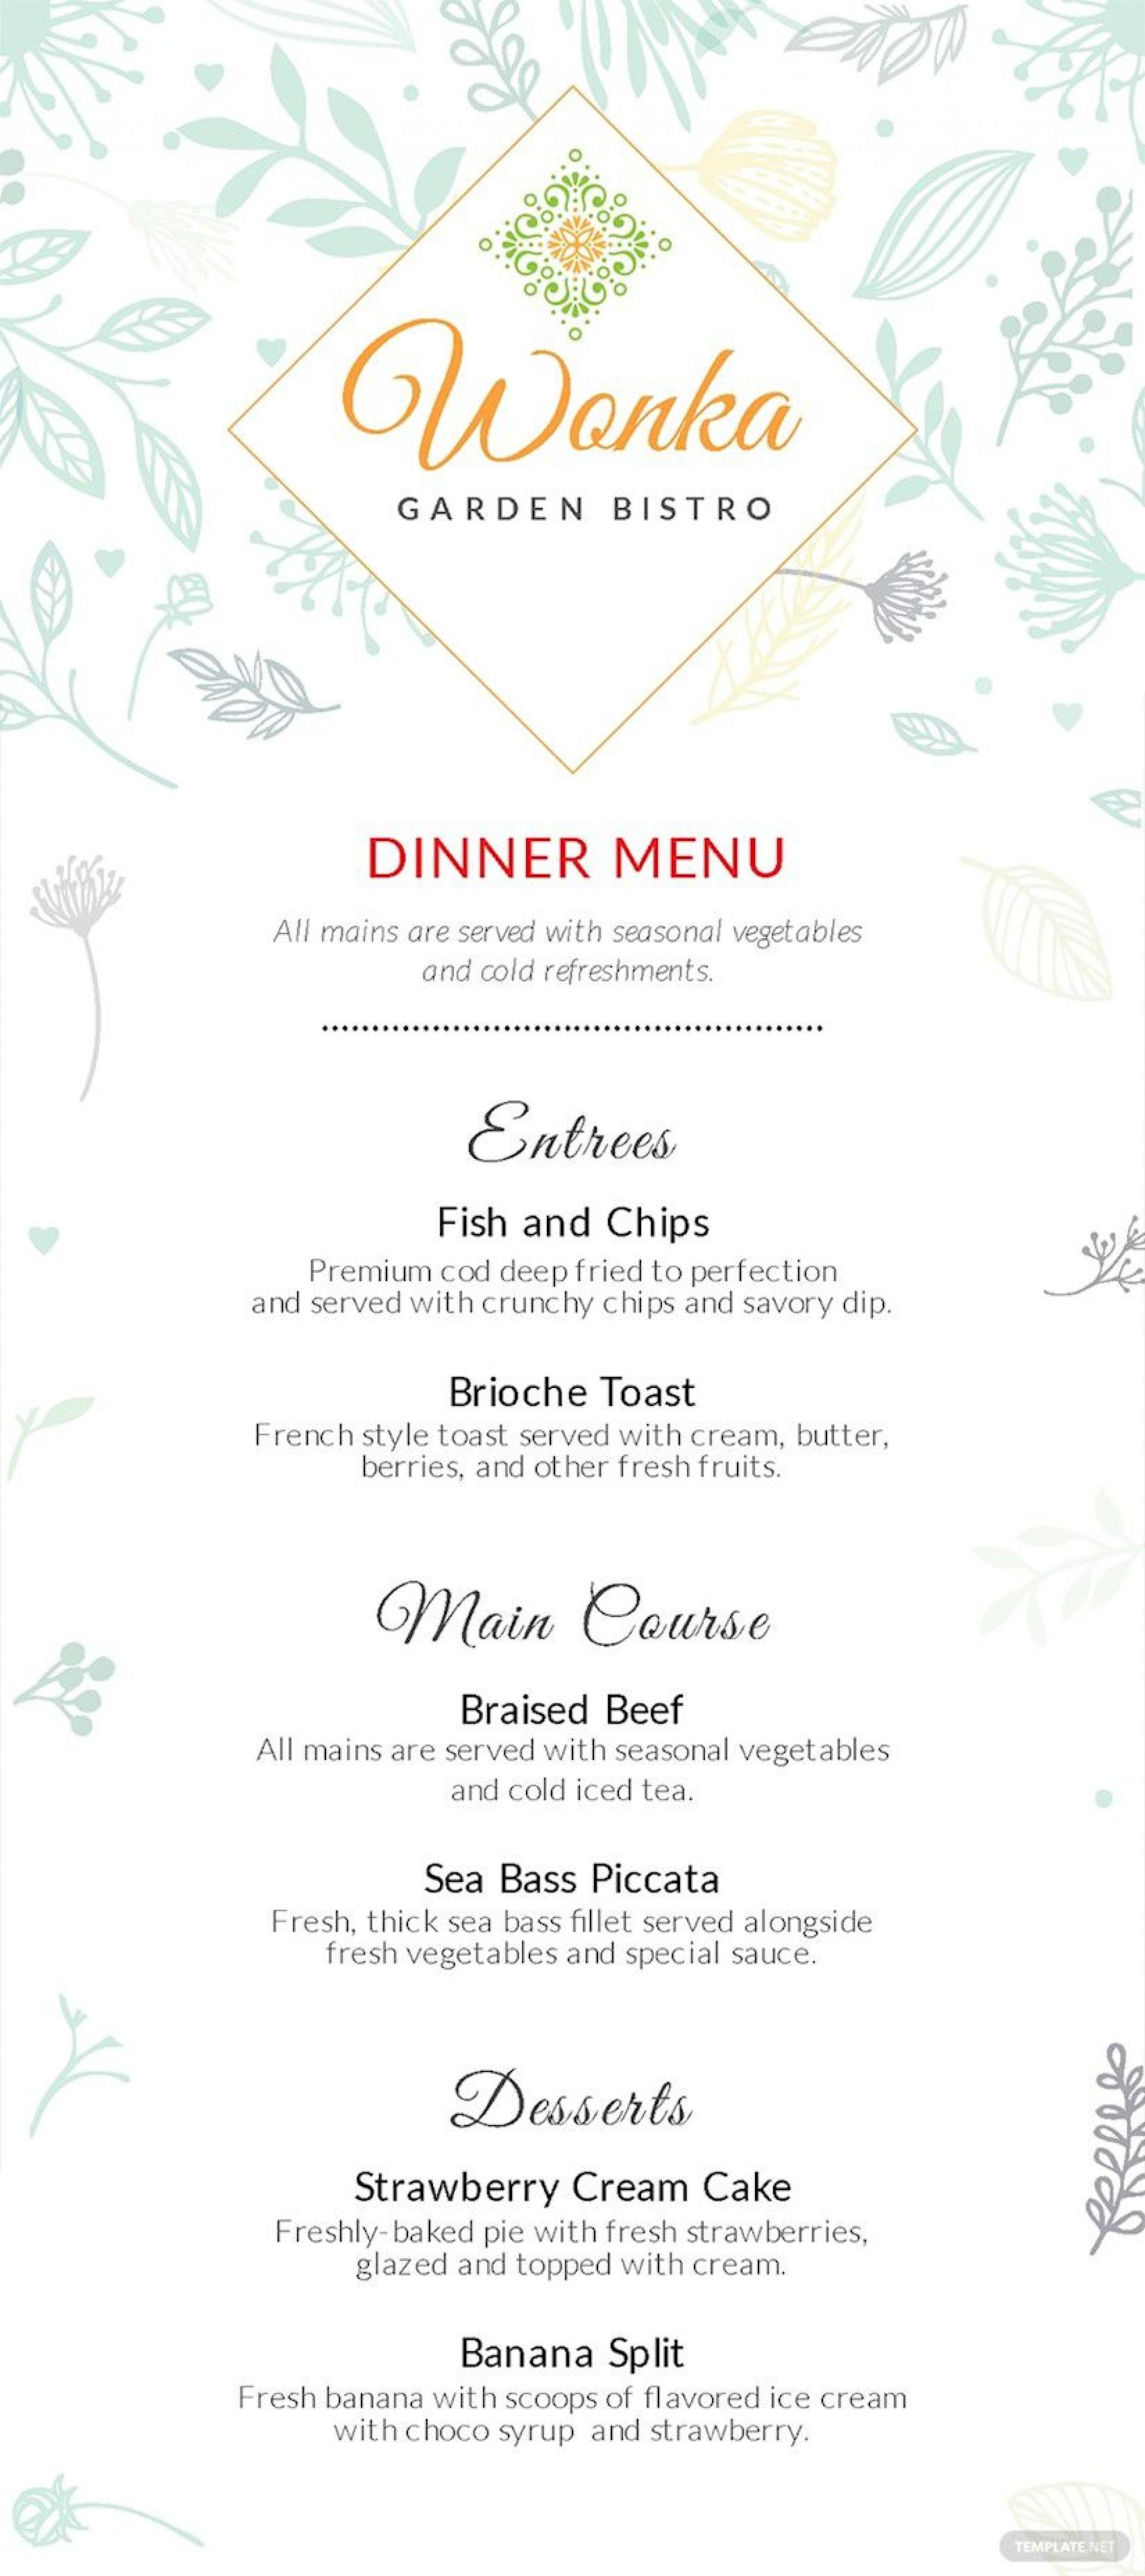 005 Shocking Dinner Party Menu Template High Def  Word Elegant Free Google Doc1920